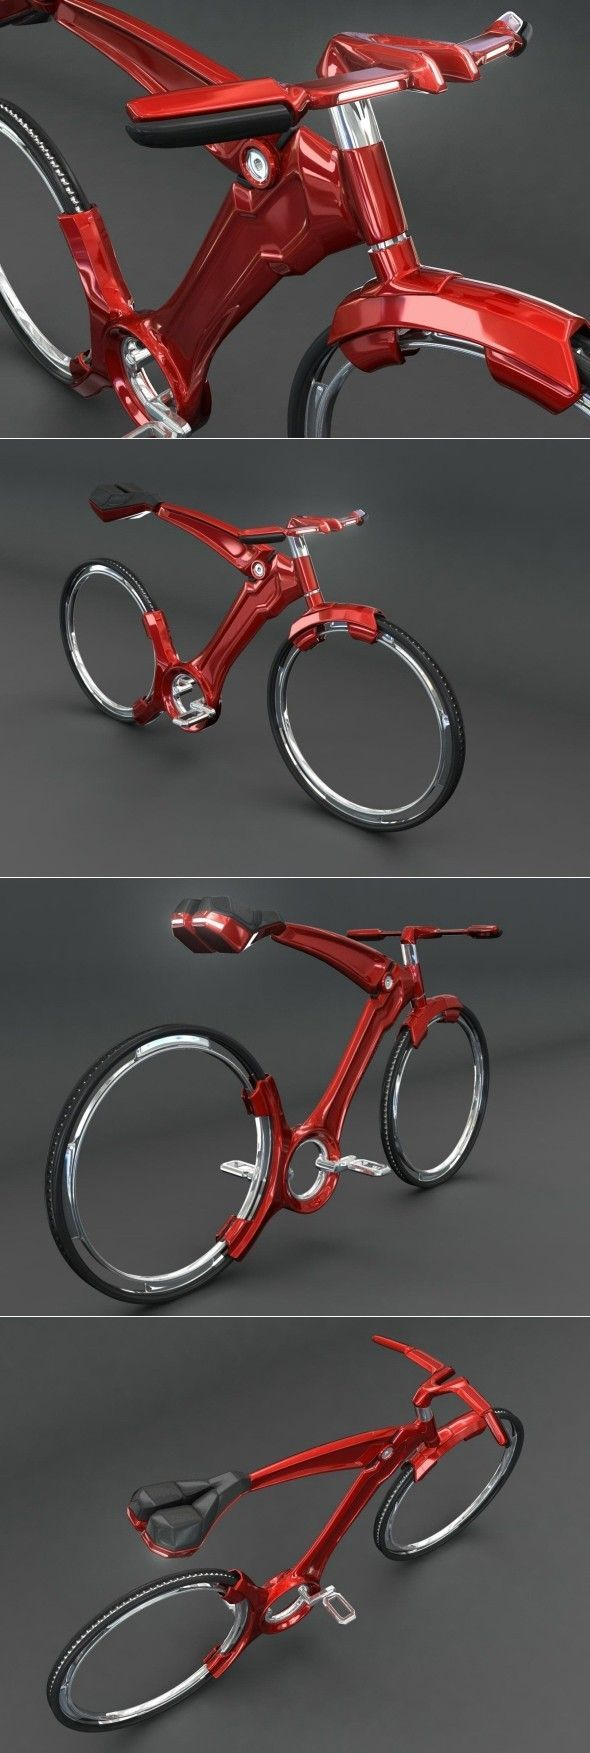 DESIGN >>> Futuristic bike by John Villarreal